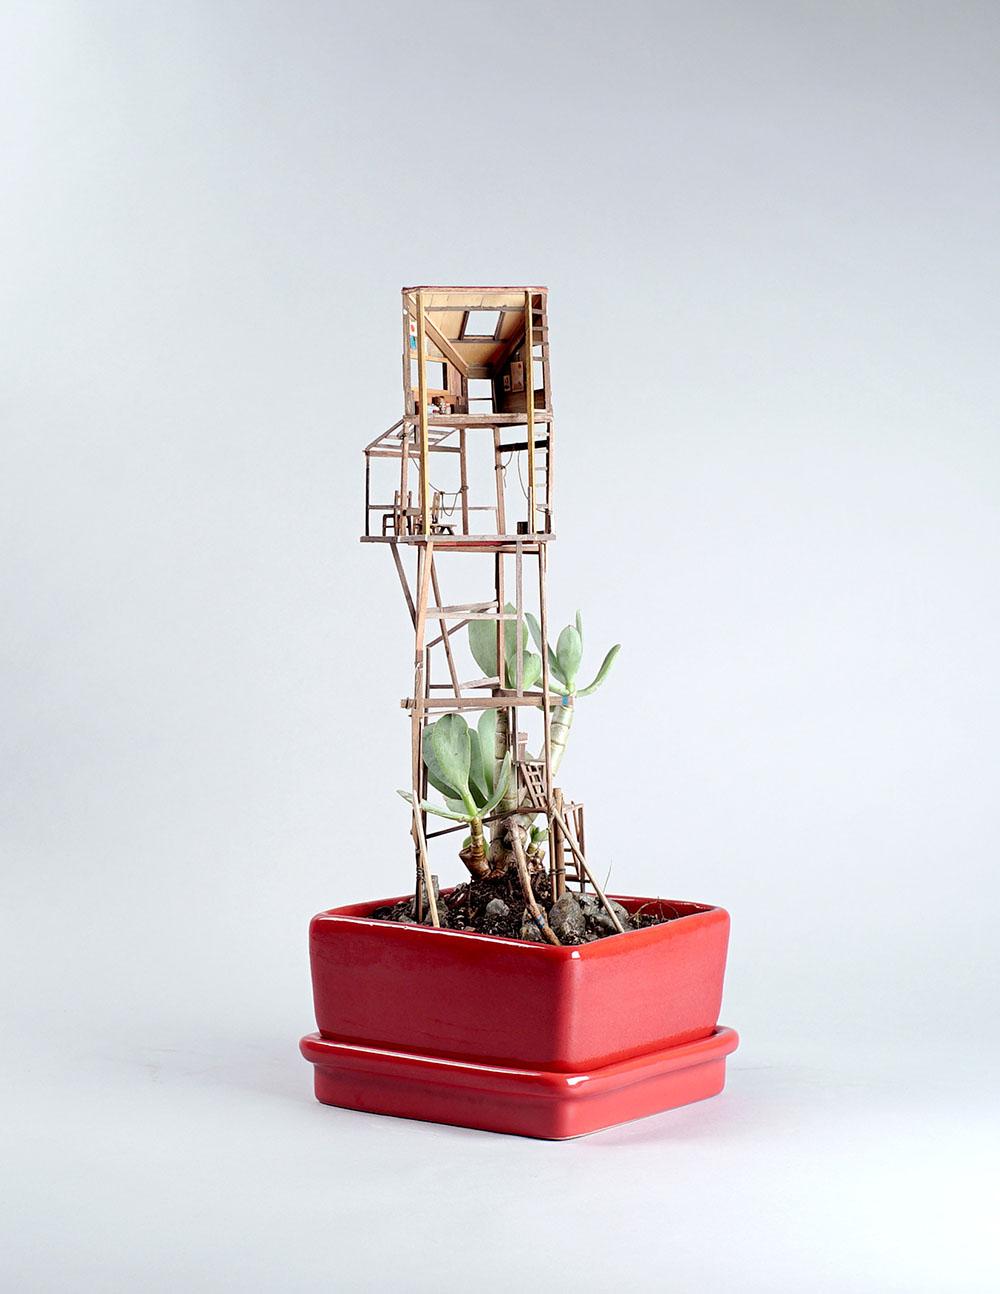 case-su-albero-miniatura-jedediah-corwyn-voltz-4